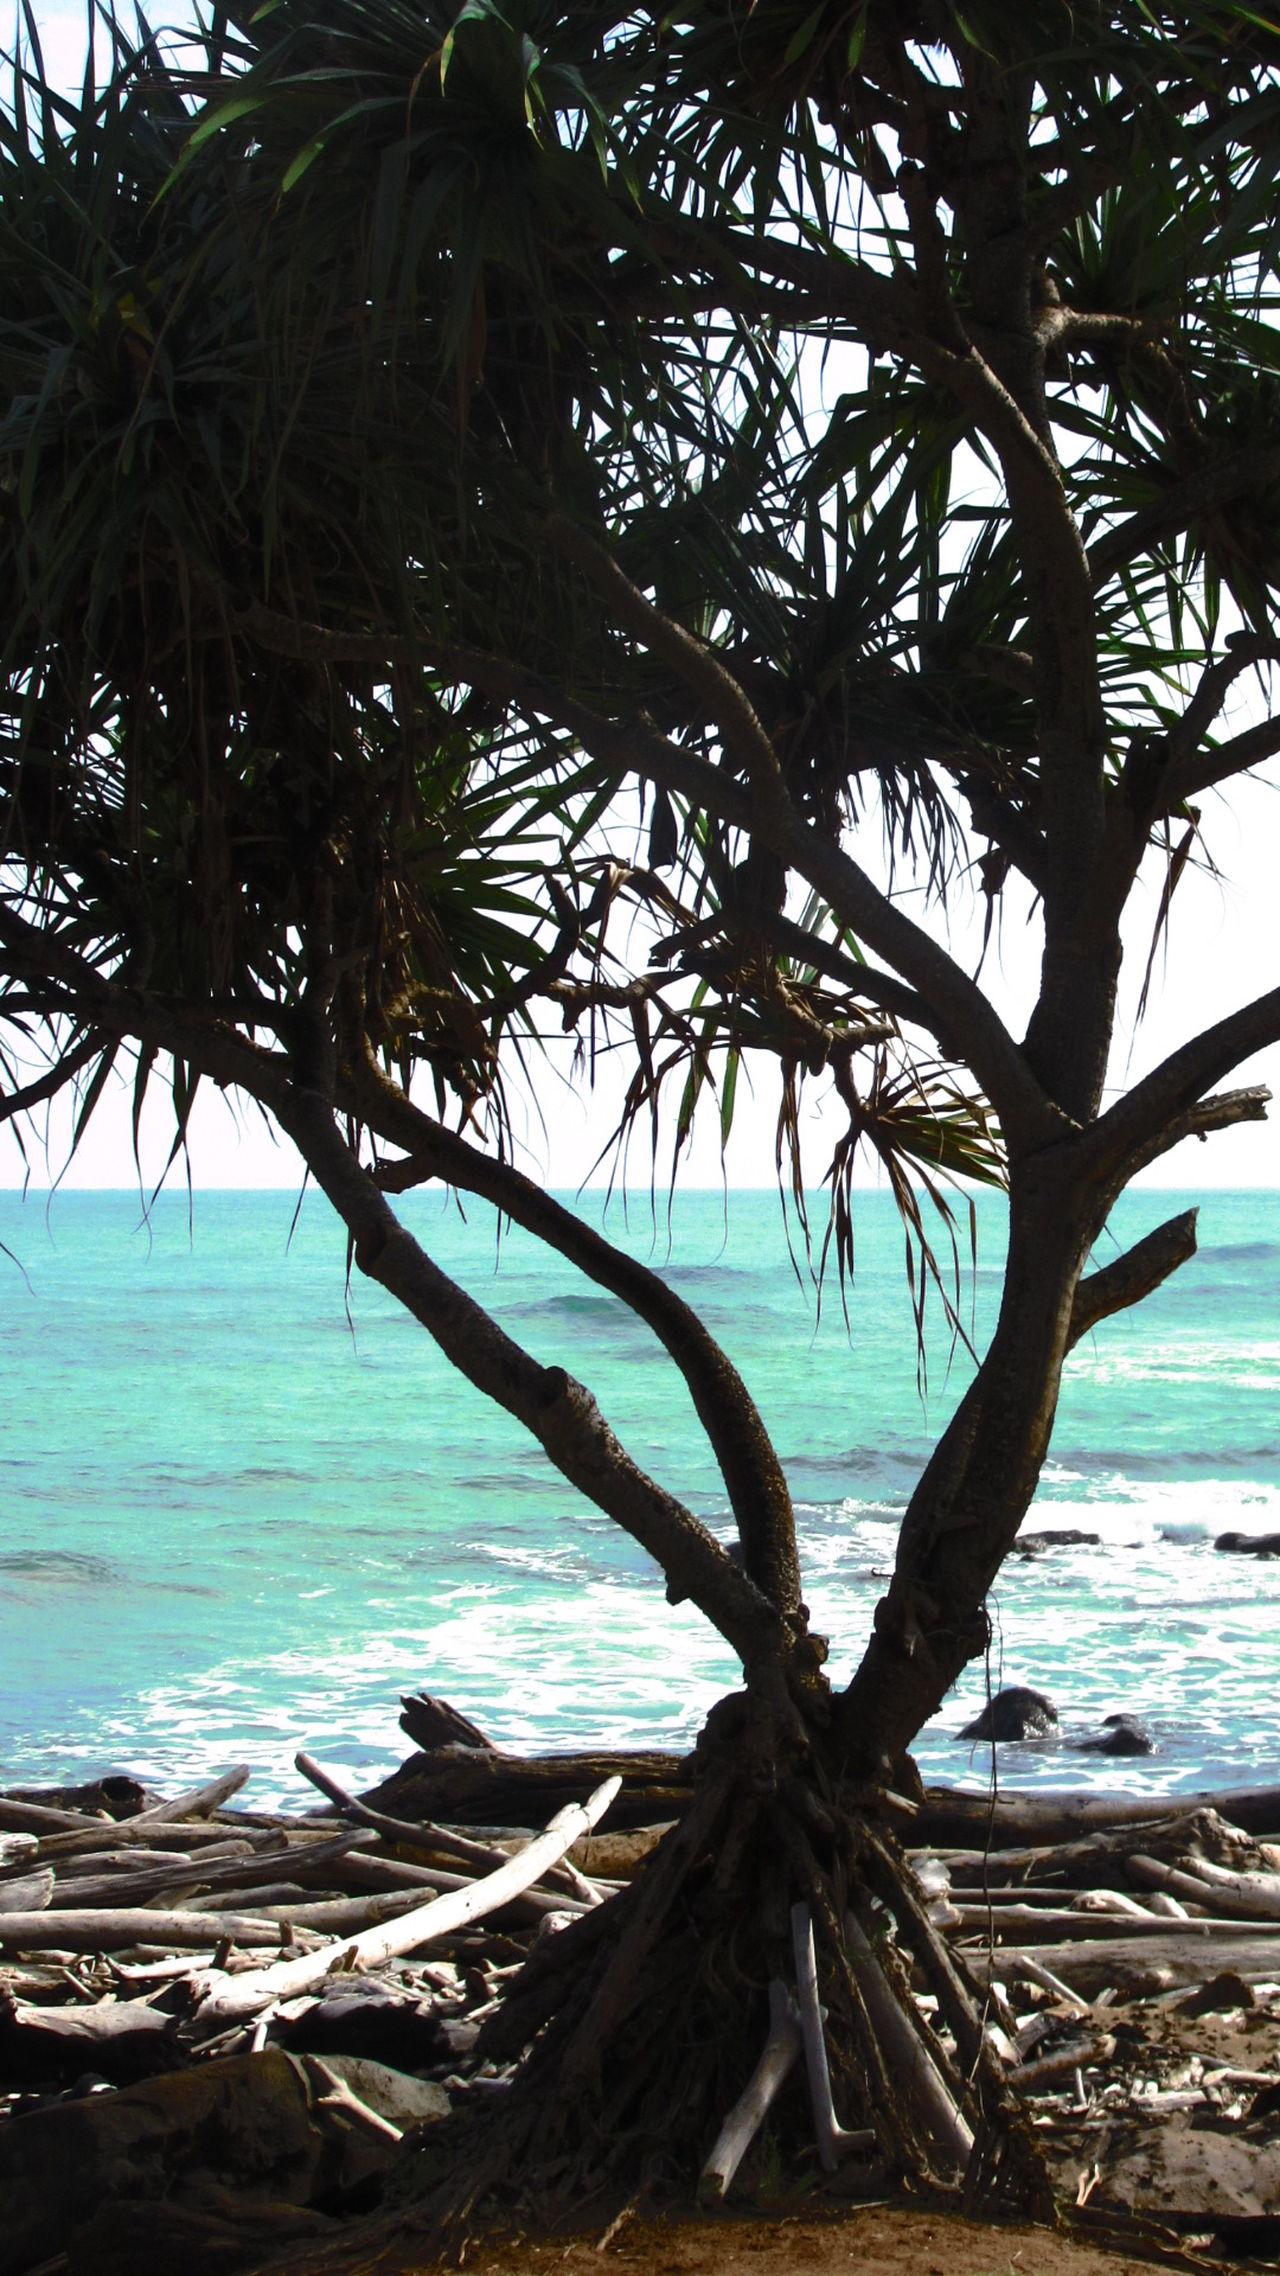 Sea Water Tree Nature Outdoors Branch Beauty In Nature Breadfruit Tree Kauai Hawaii Single Tree No People